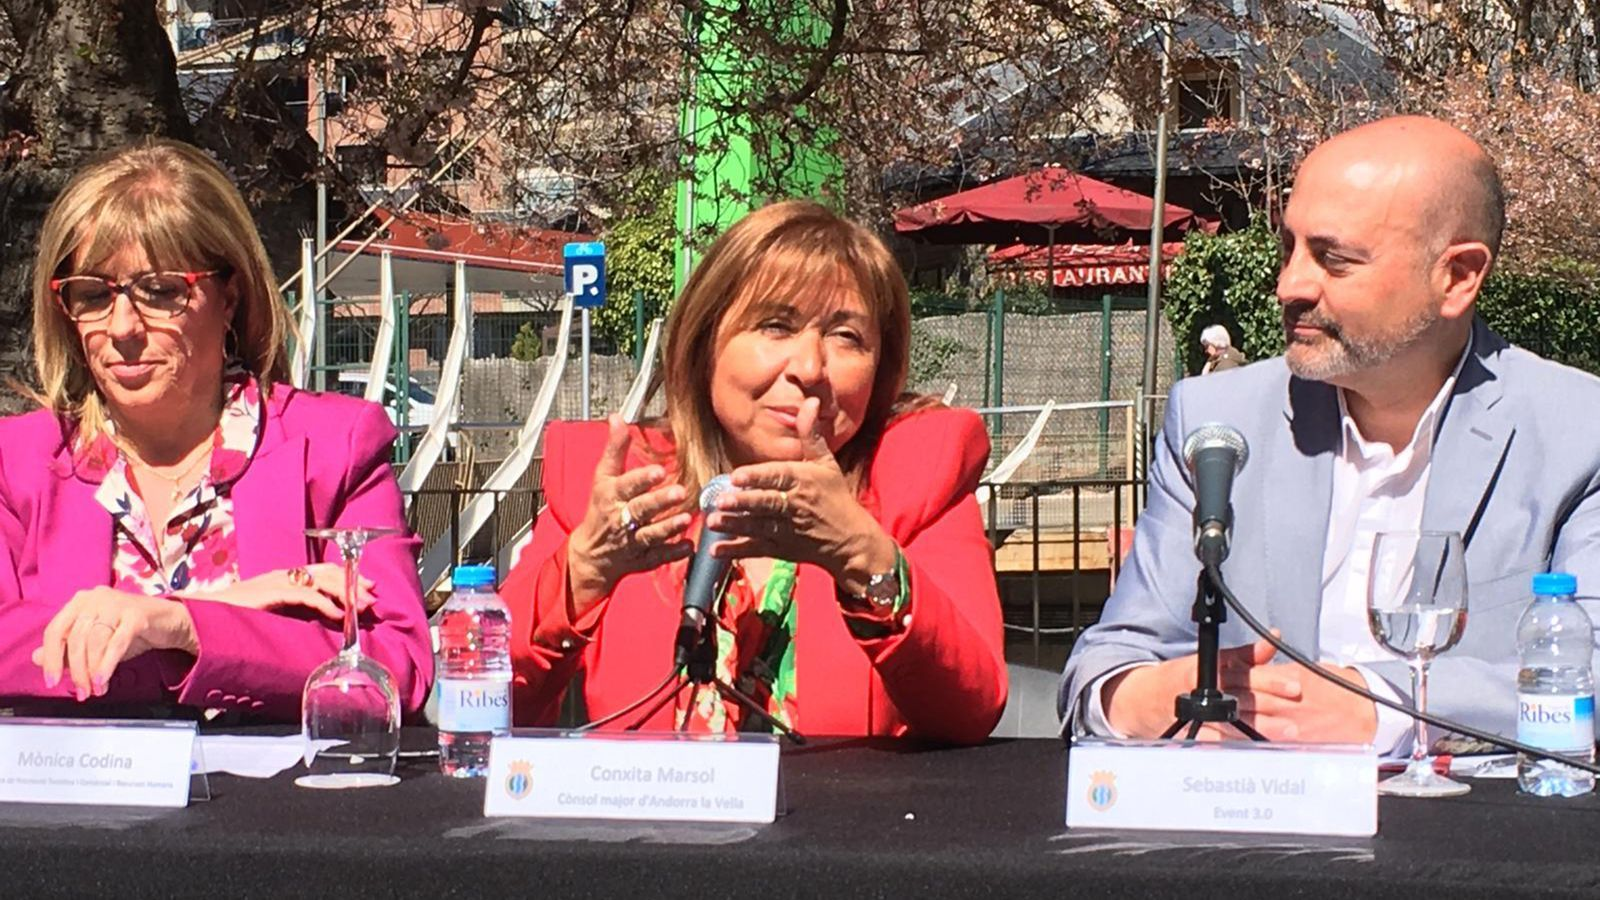 Marsol presenta la Festa de la primavera al Parc Central d'Andorra la Vella. / M. R. F.